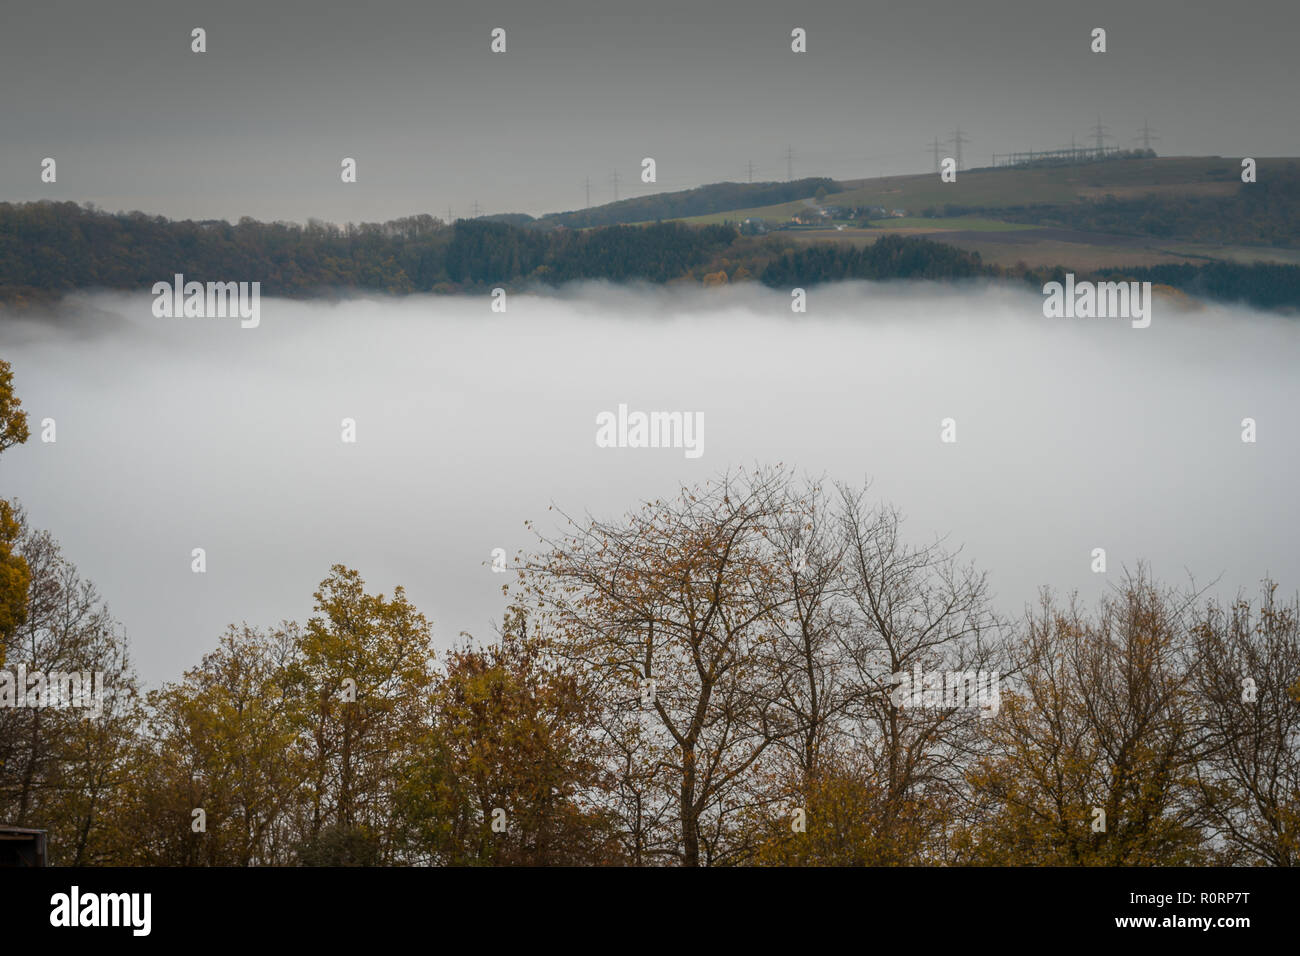 Foggy Landscape Valley Germany - Stock Image